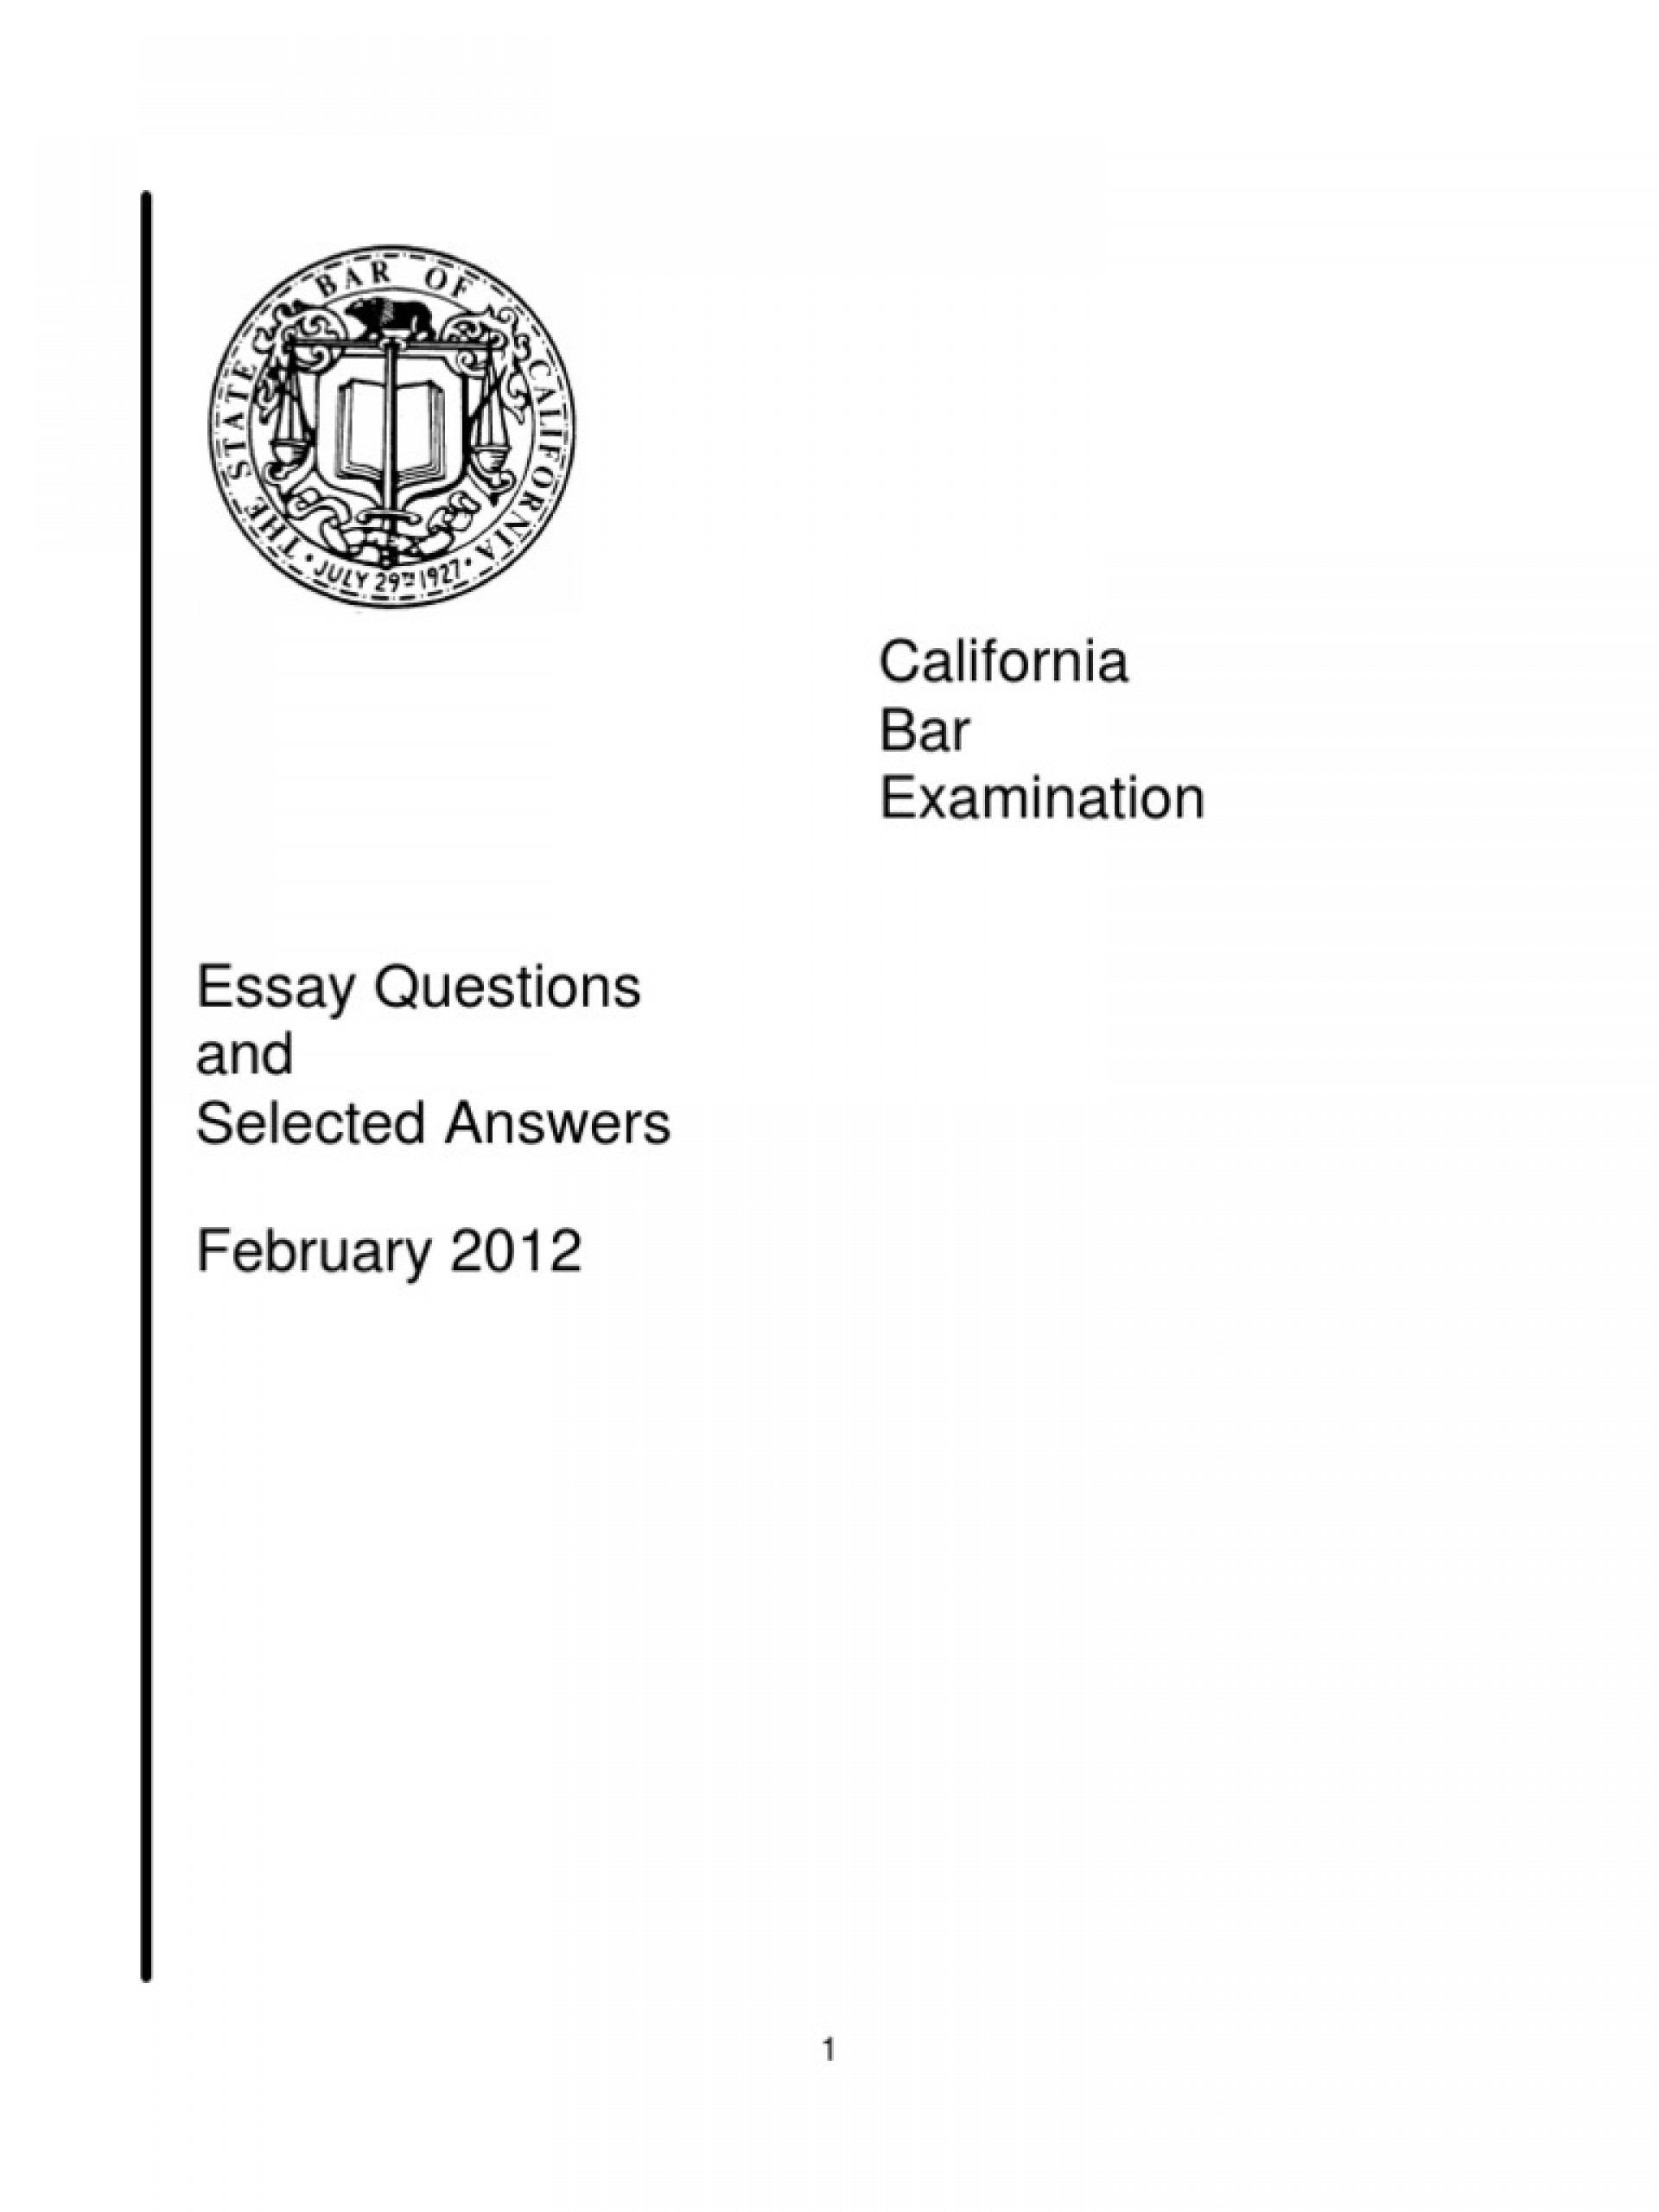 020 California Bar Essays Essay Example Exam February Selected A 58bfe824b6d87fac848b5294 Marvelous July 2017 Graded 2018 1920